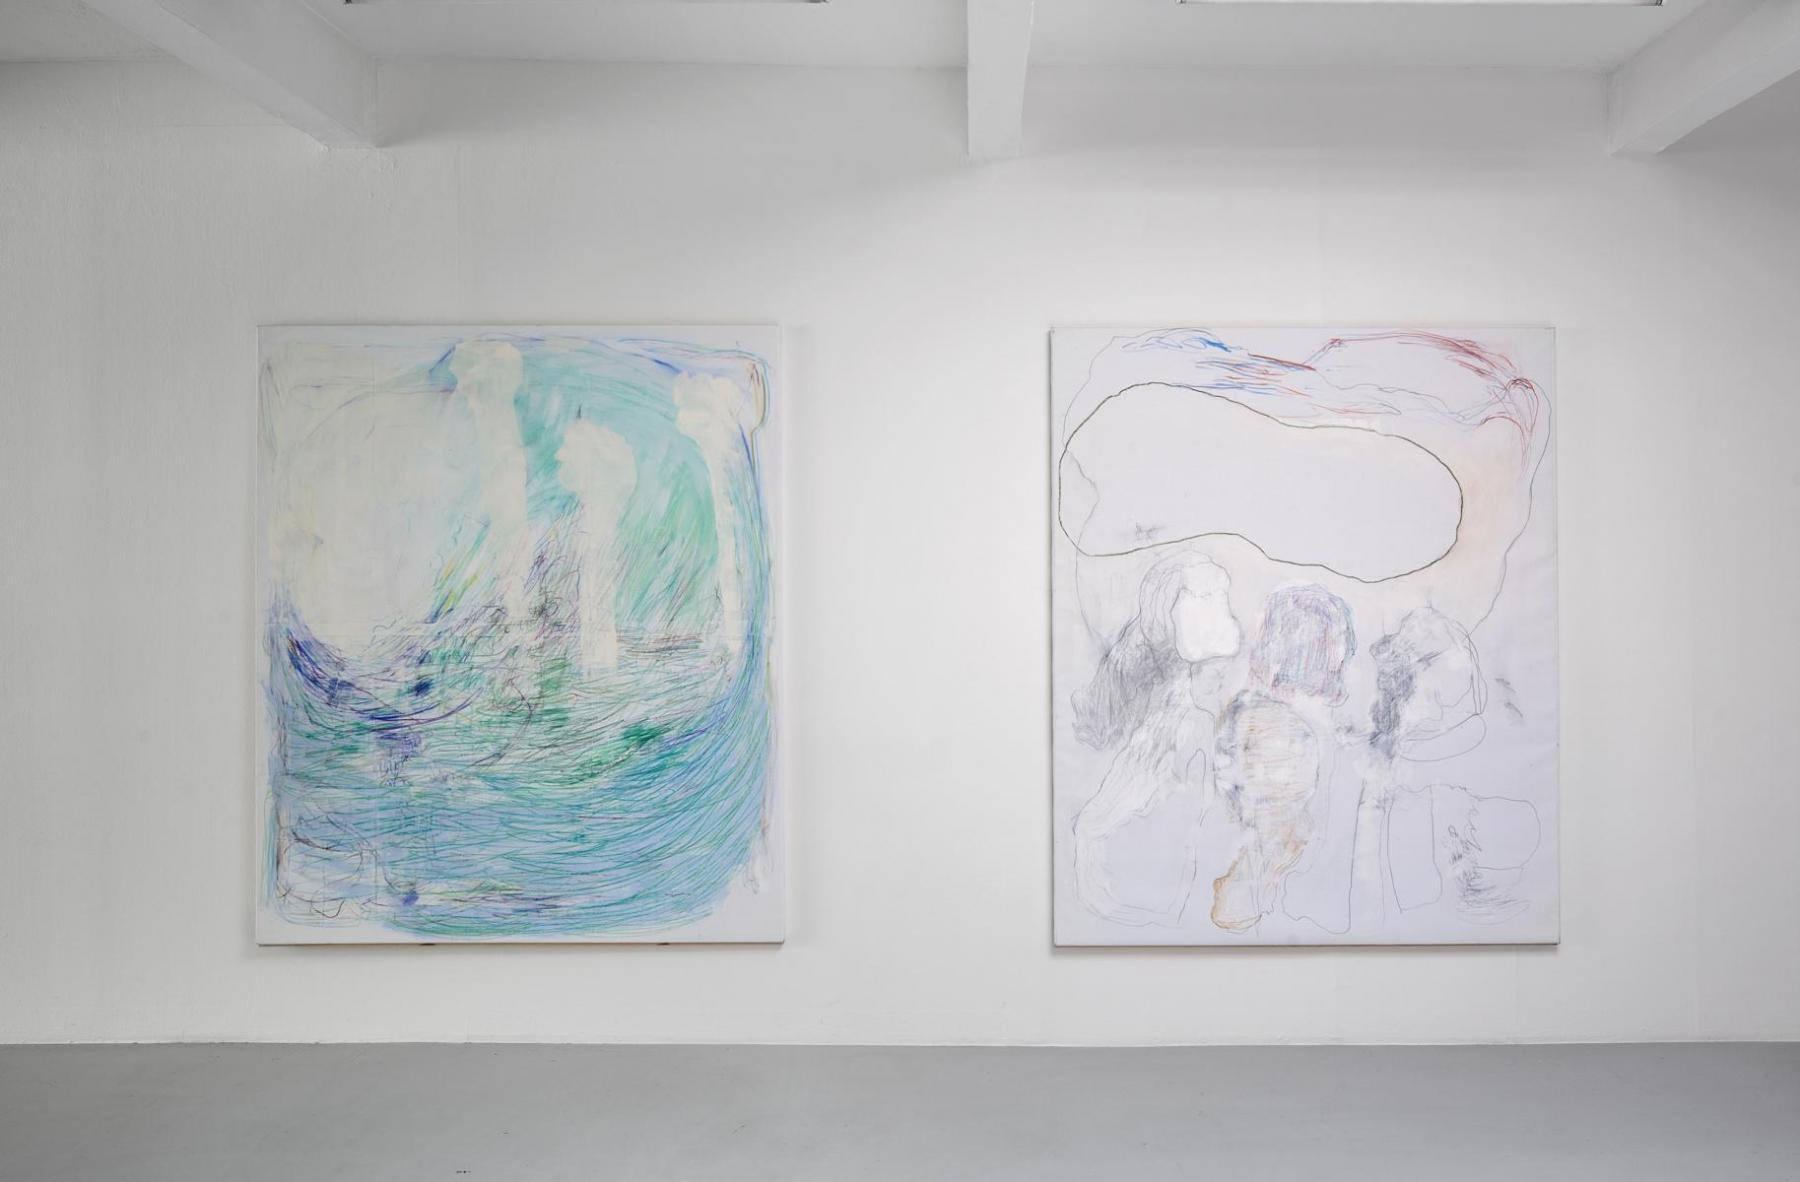 K1600_Mosny_Gonn_2017_Ausstellungsansicht_Verena_Nagl_14